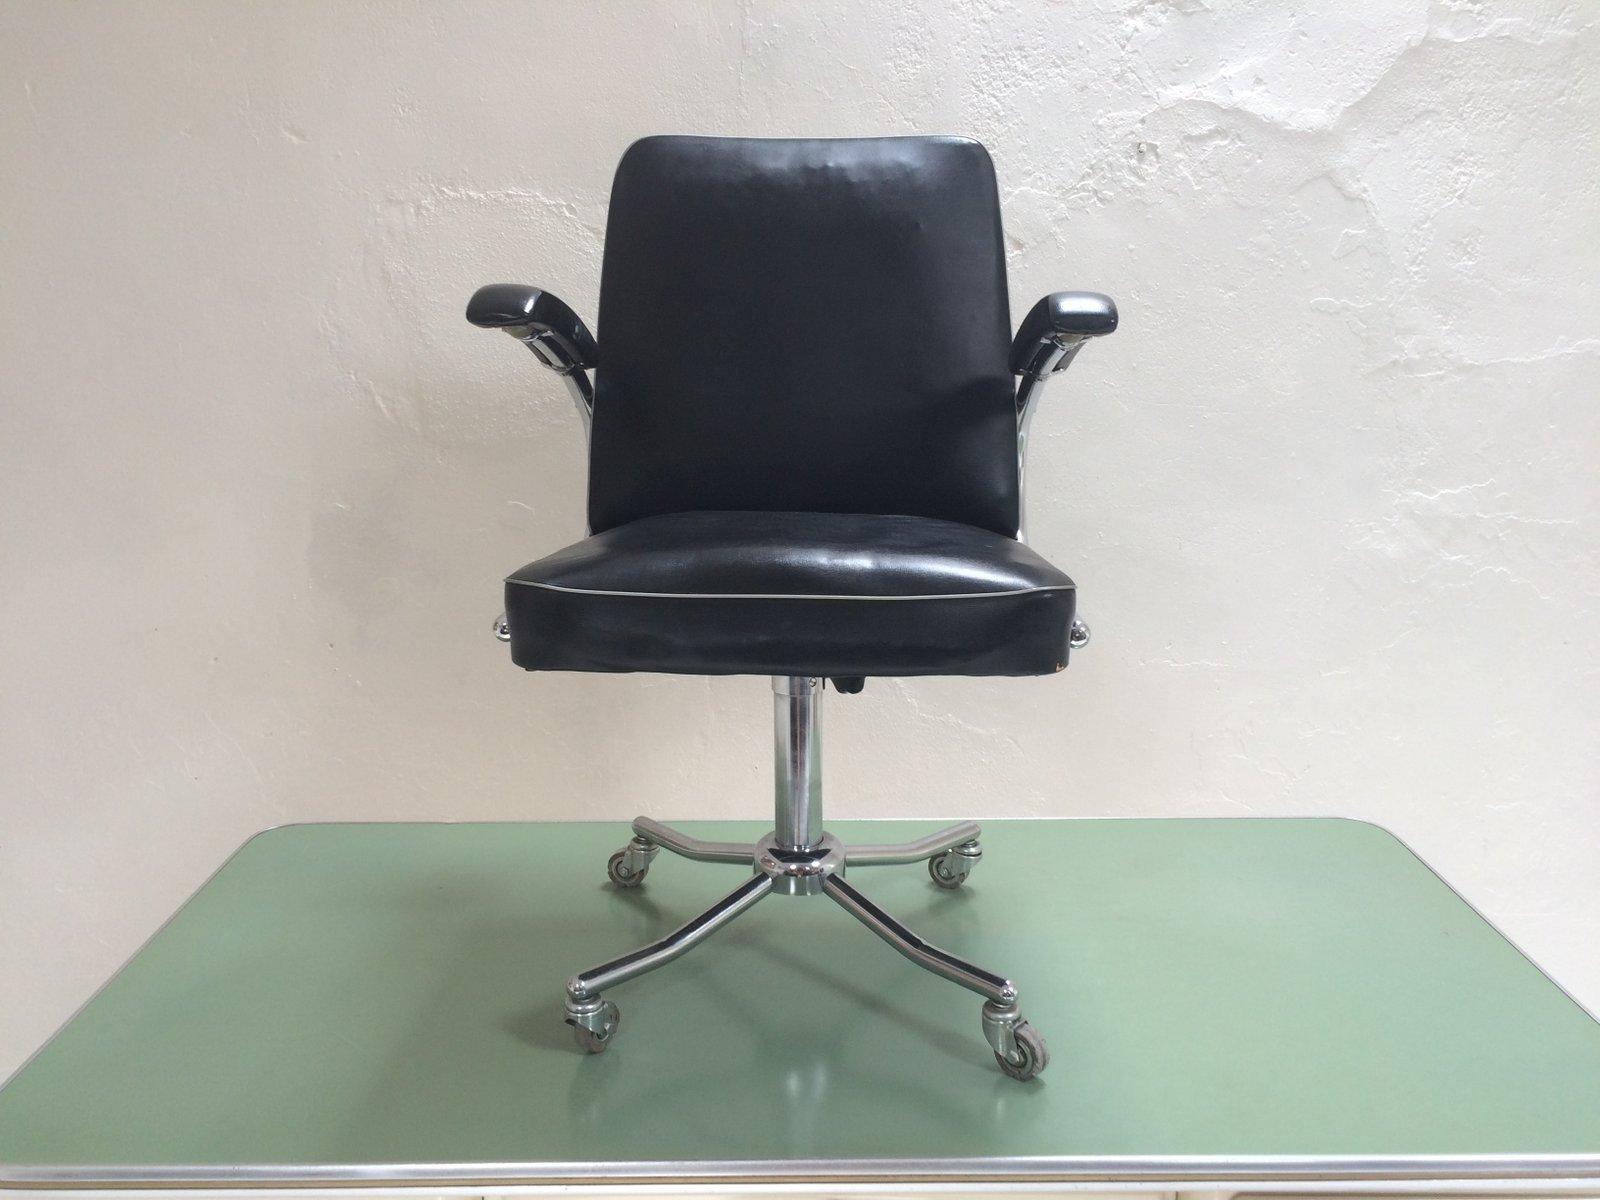 doctor 39 s office desk chair from maquet of rastatt 1950s